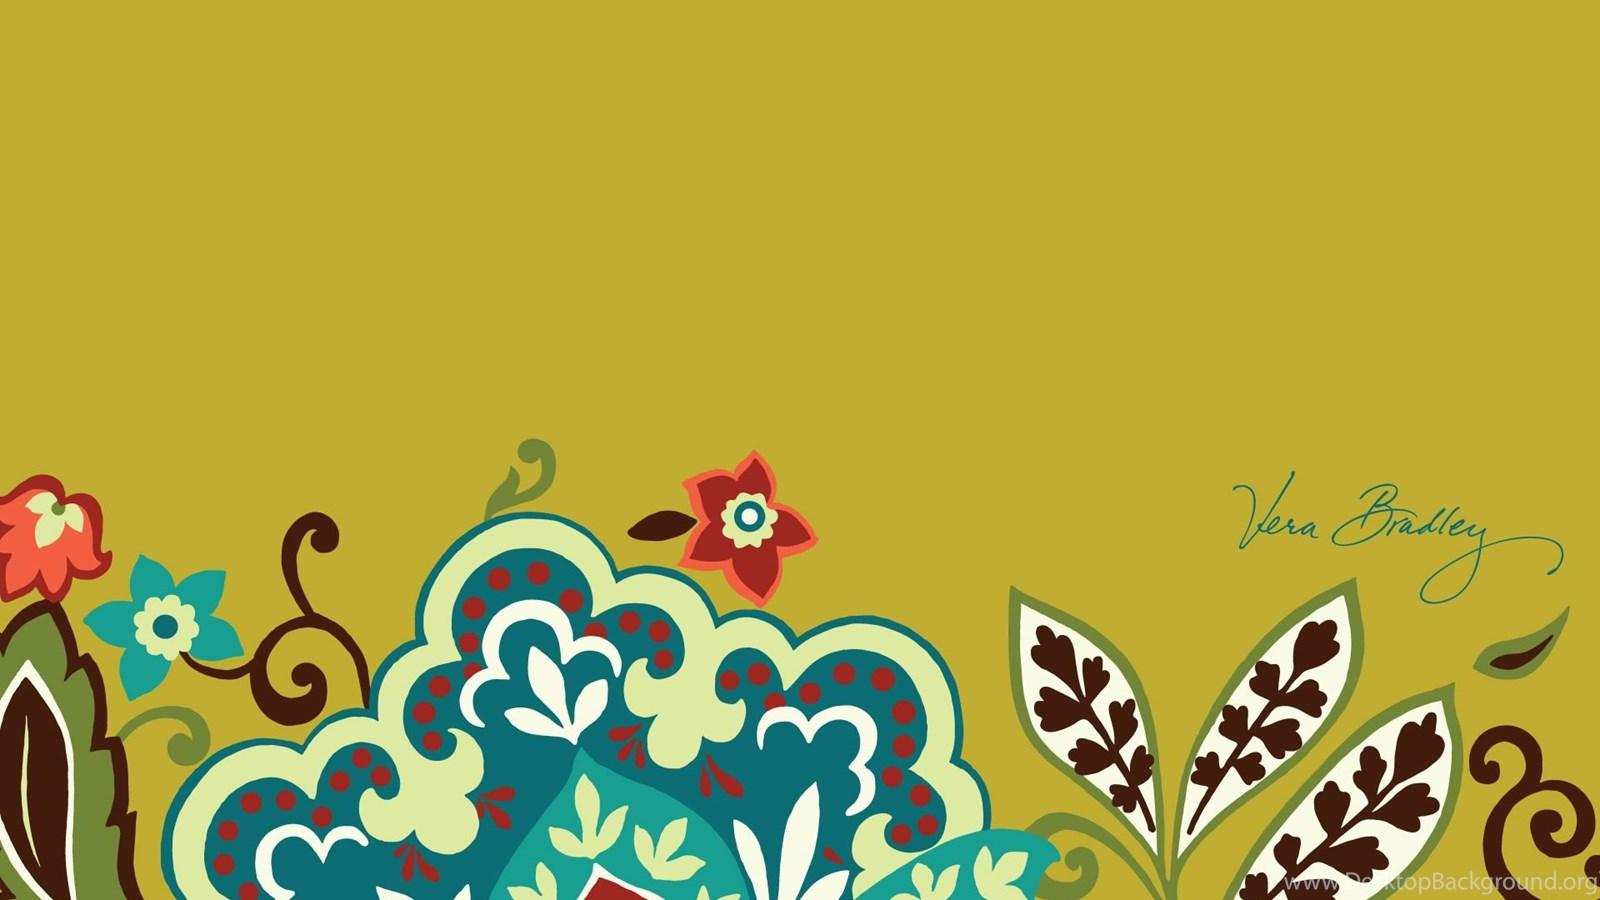 Vera Bradley Patterns Wallpapers 2013 Desktop Background